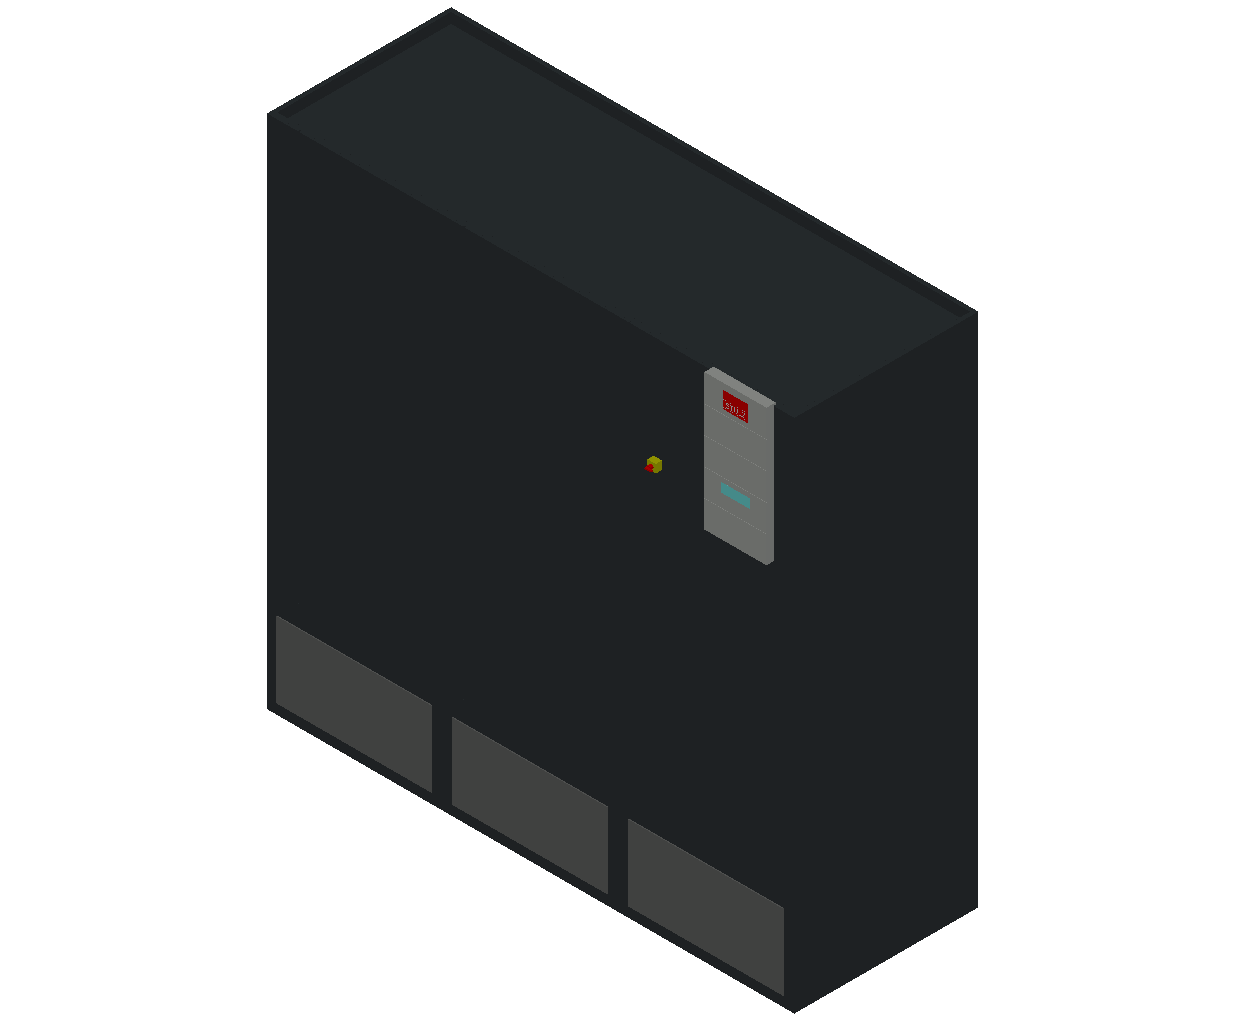 HC_Air Conditioner_Indoor Unit_MEPcontent_STULZ_CyberAir 3PRO_ALR_Dual Circuit GES_ALR_732_GES_INT-EN.dwg